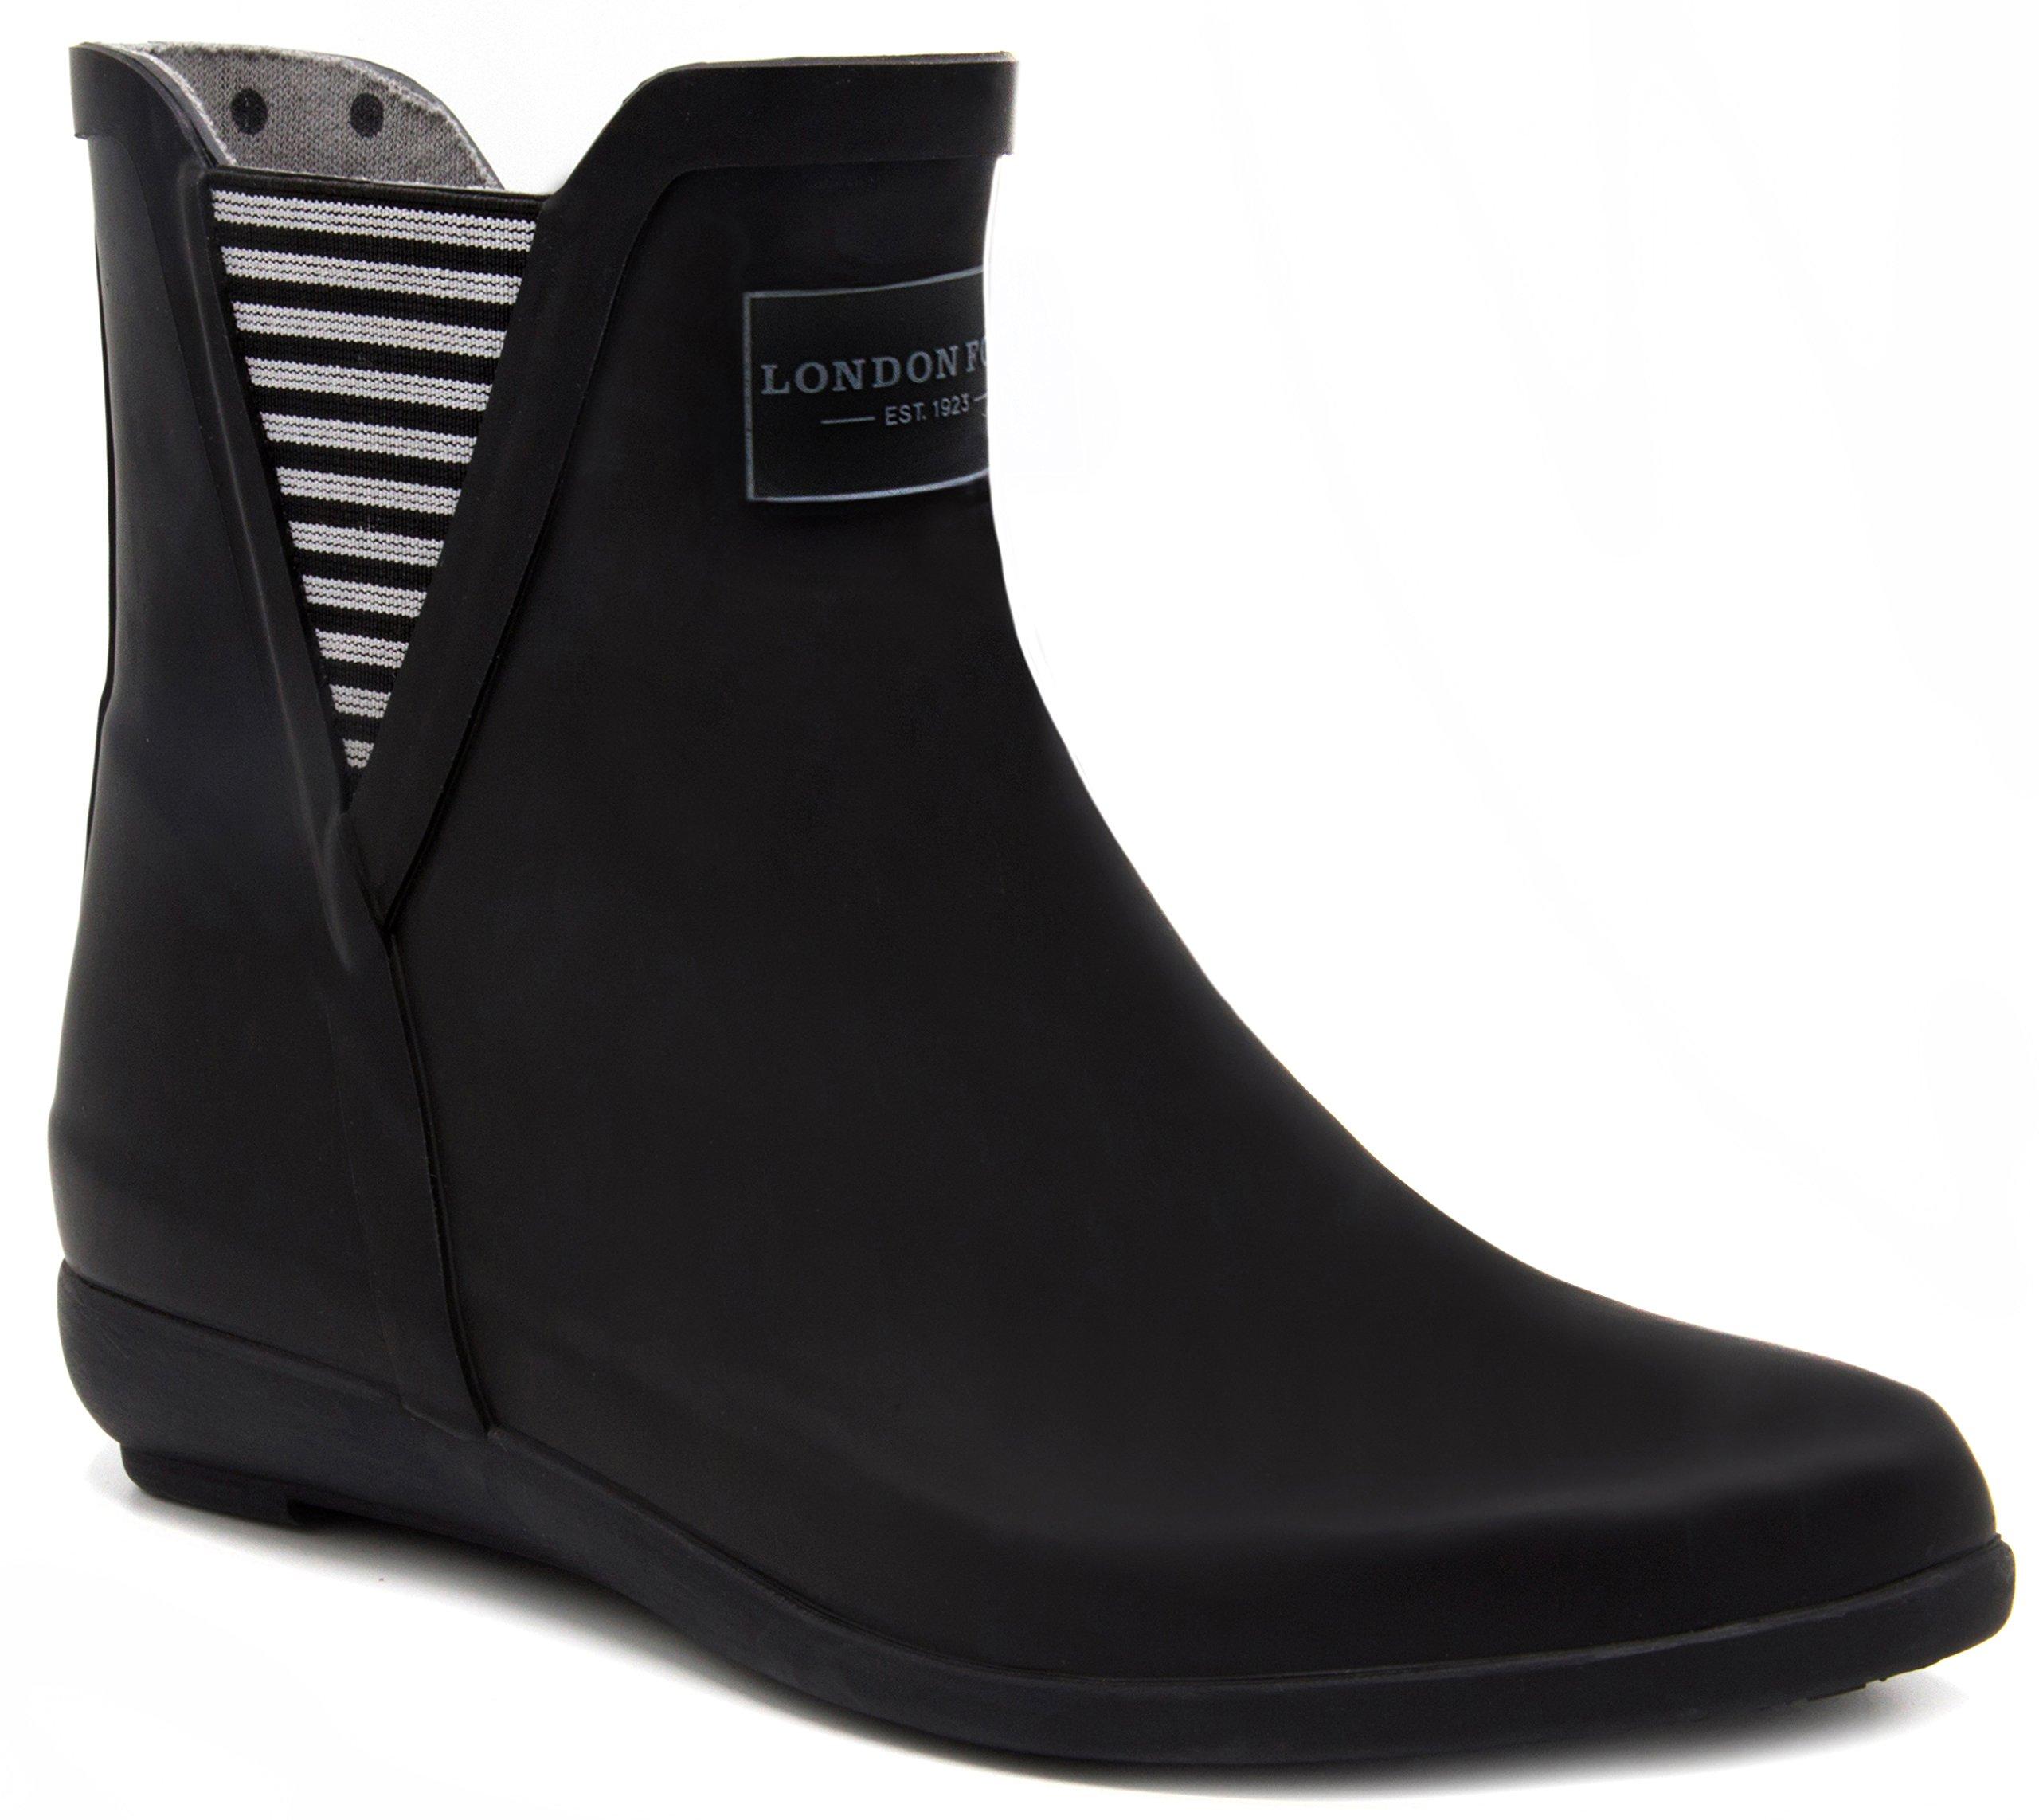 London Fog Womens Piccadilly Rain Boot Black 8 M US